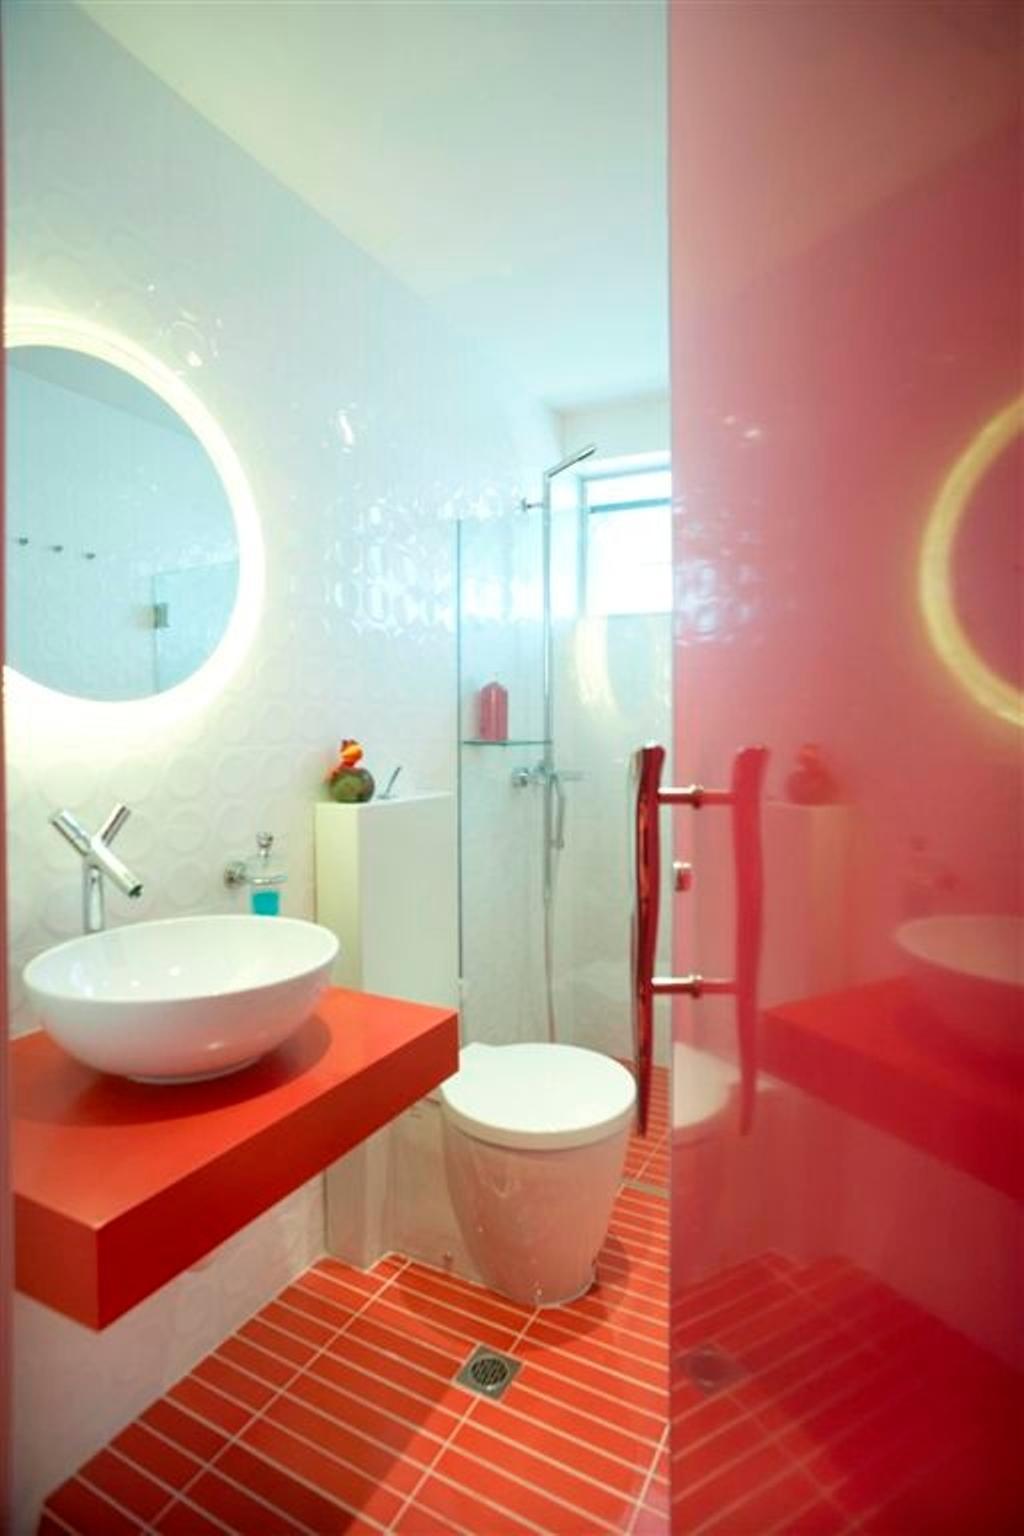 Transitional, Landed, Sembawang, Interior Designer, Free Space Intent, Bathroom, Indoors, Interior Design, Room